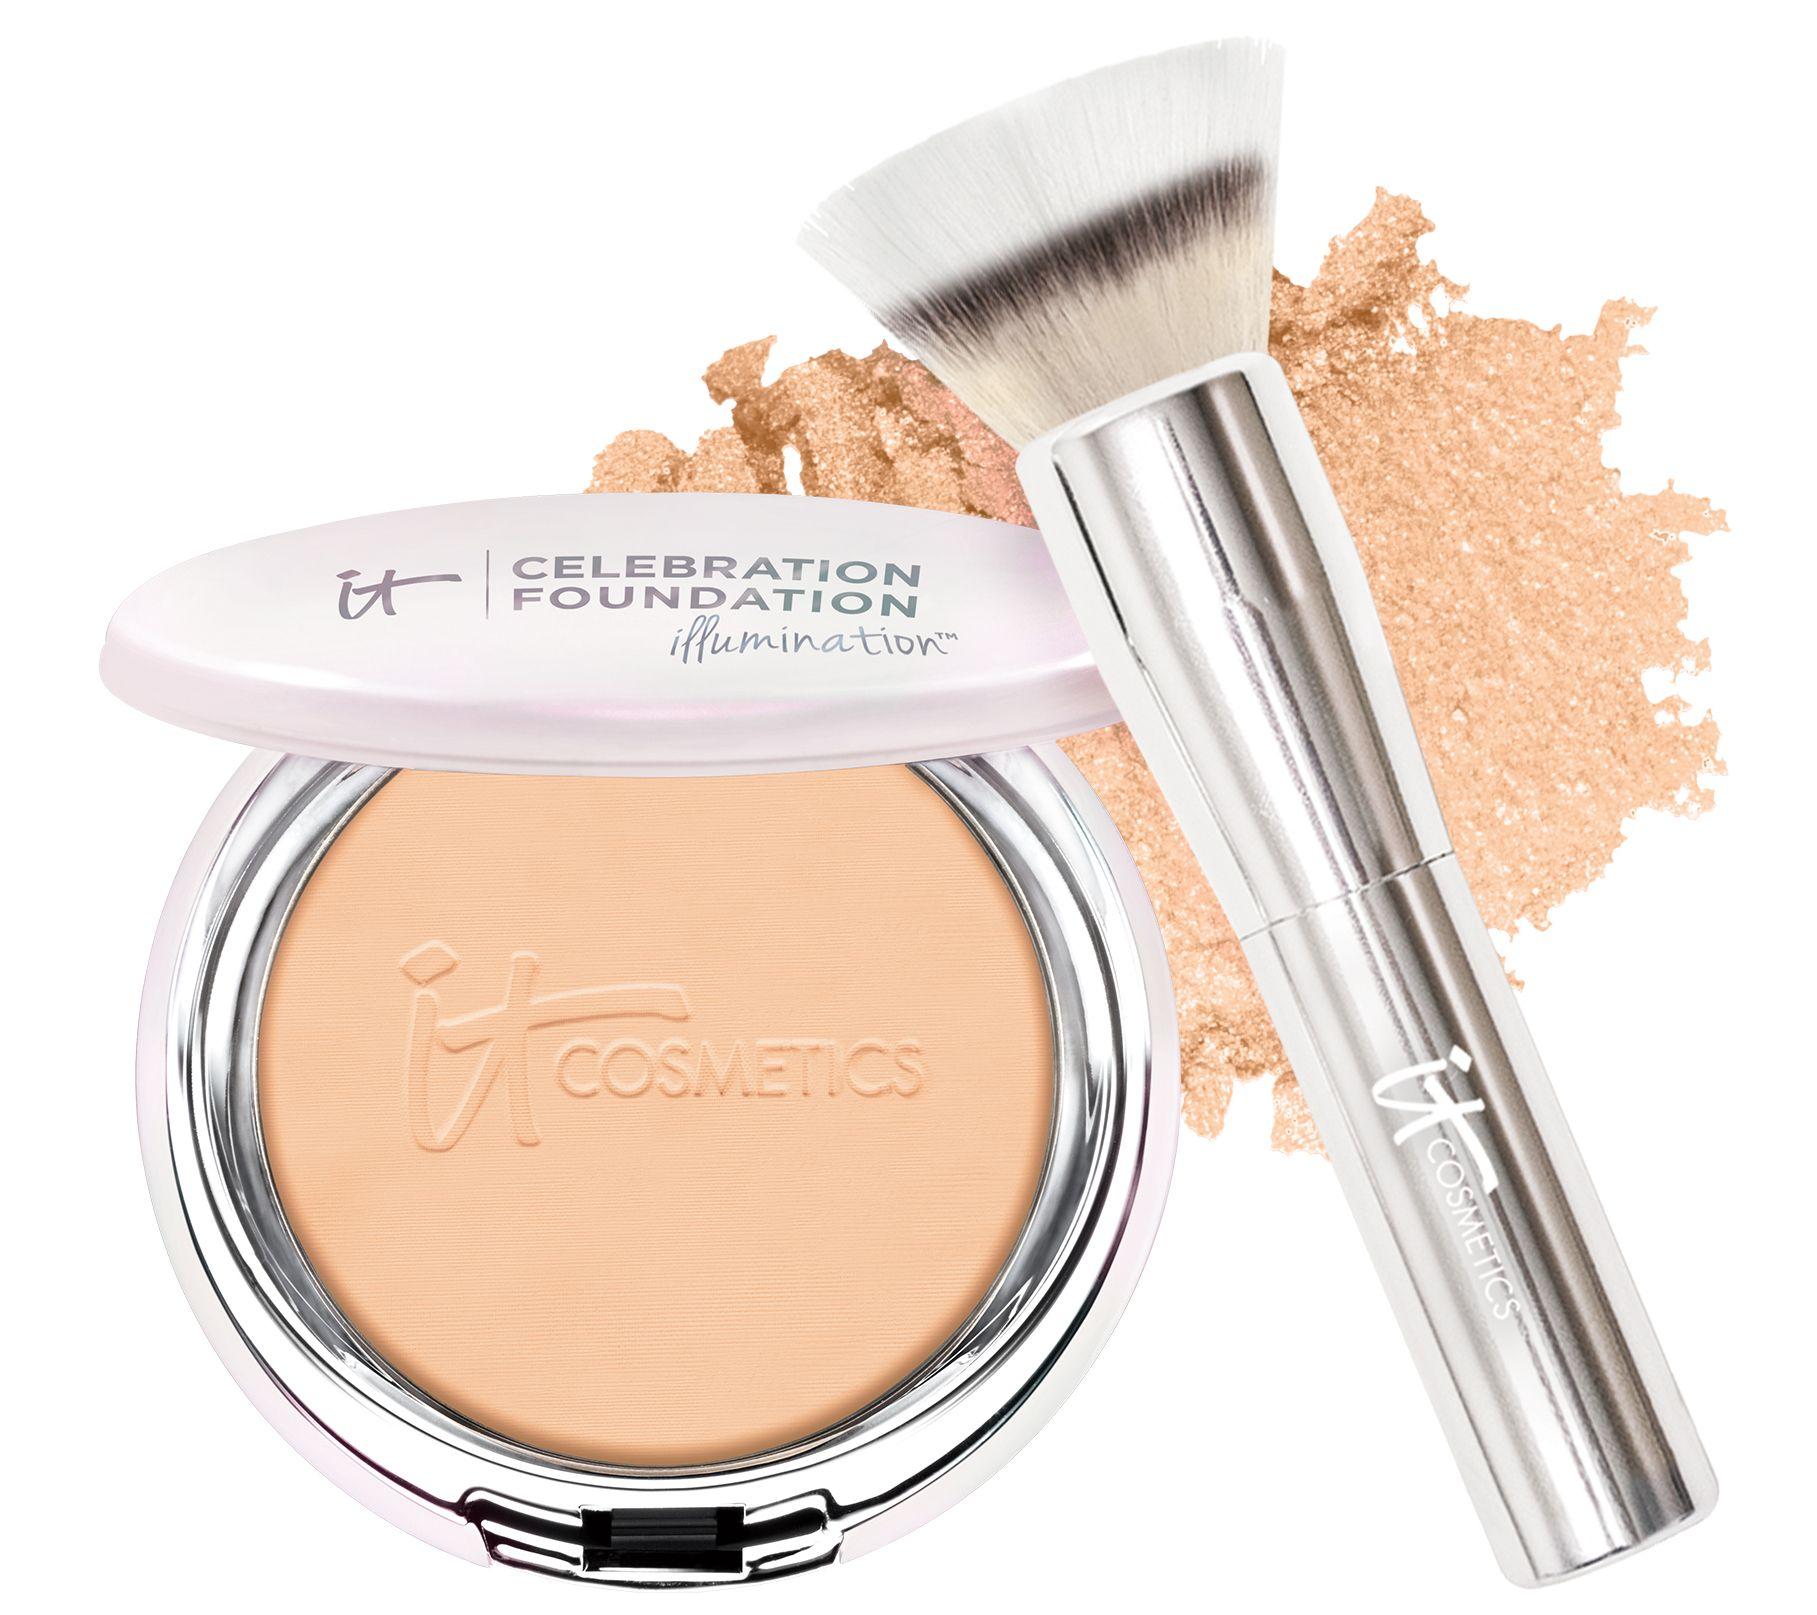 It Cosmetics x ULTA Airbrush Smoothing Foundation Brush #102 by IT Cosmetics #12